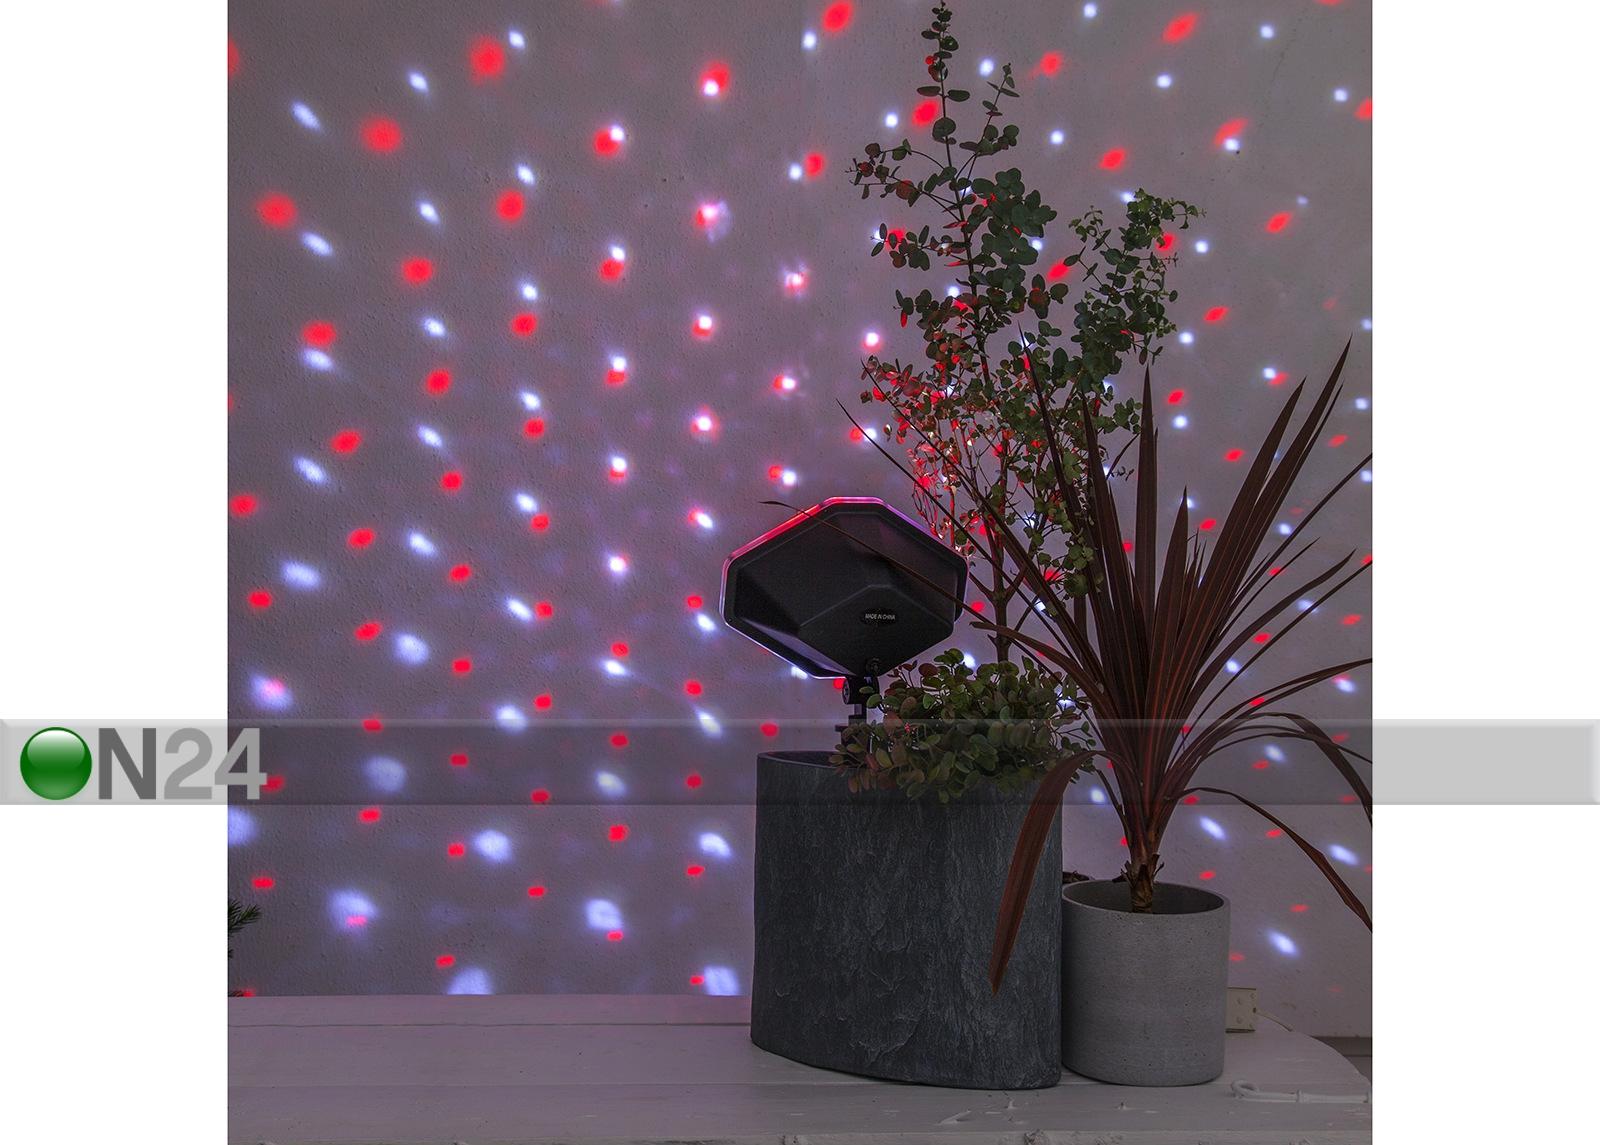 4698d0238fa Laser Ledlight AA-142900 - ON24 Sisustuskaubamaja